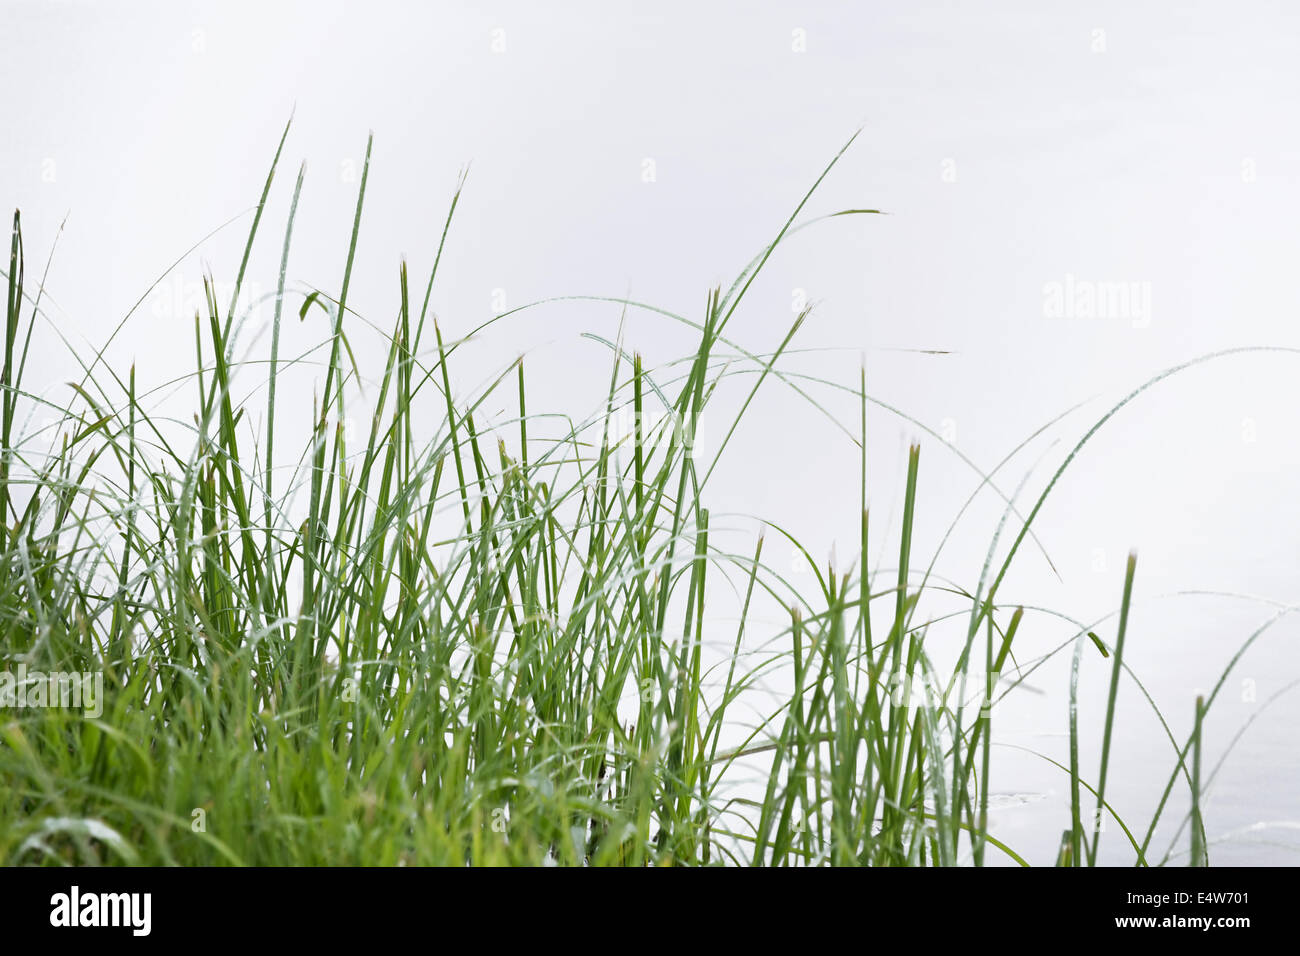 blades of green summer grass - Stock Image